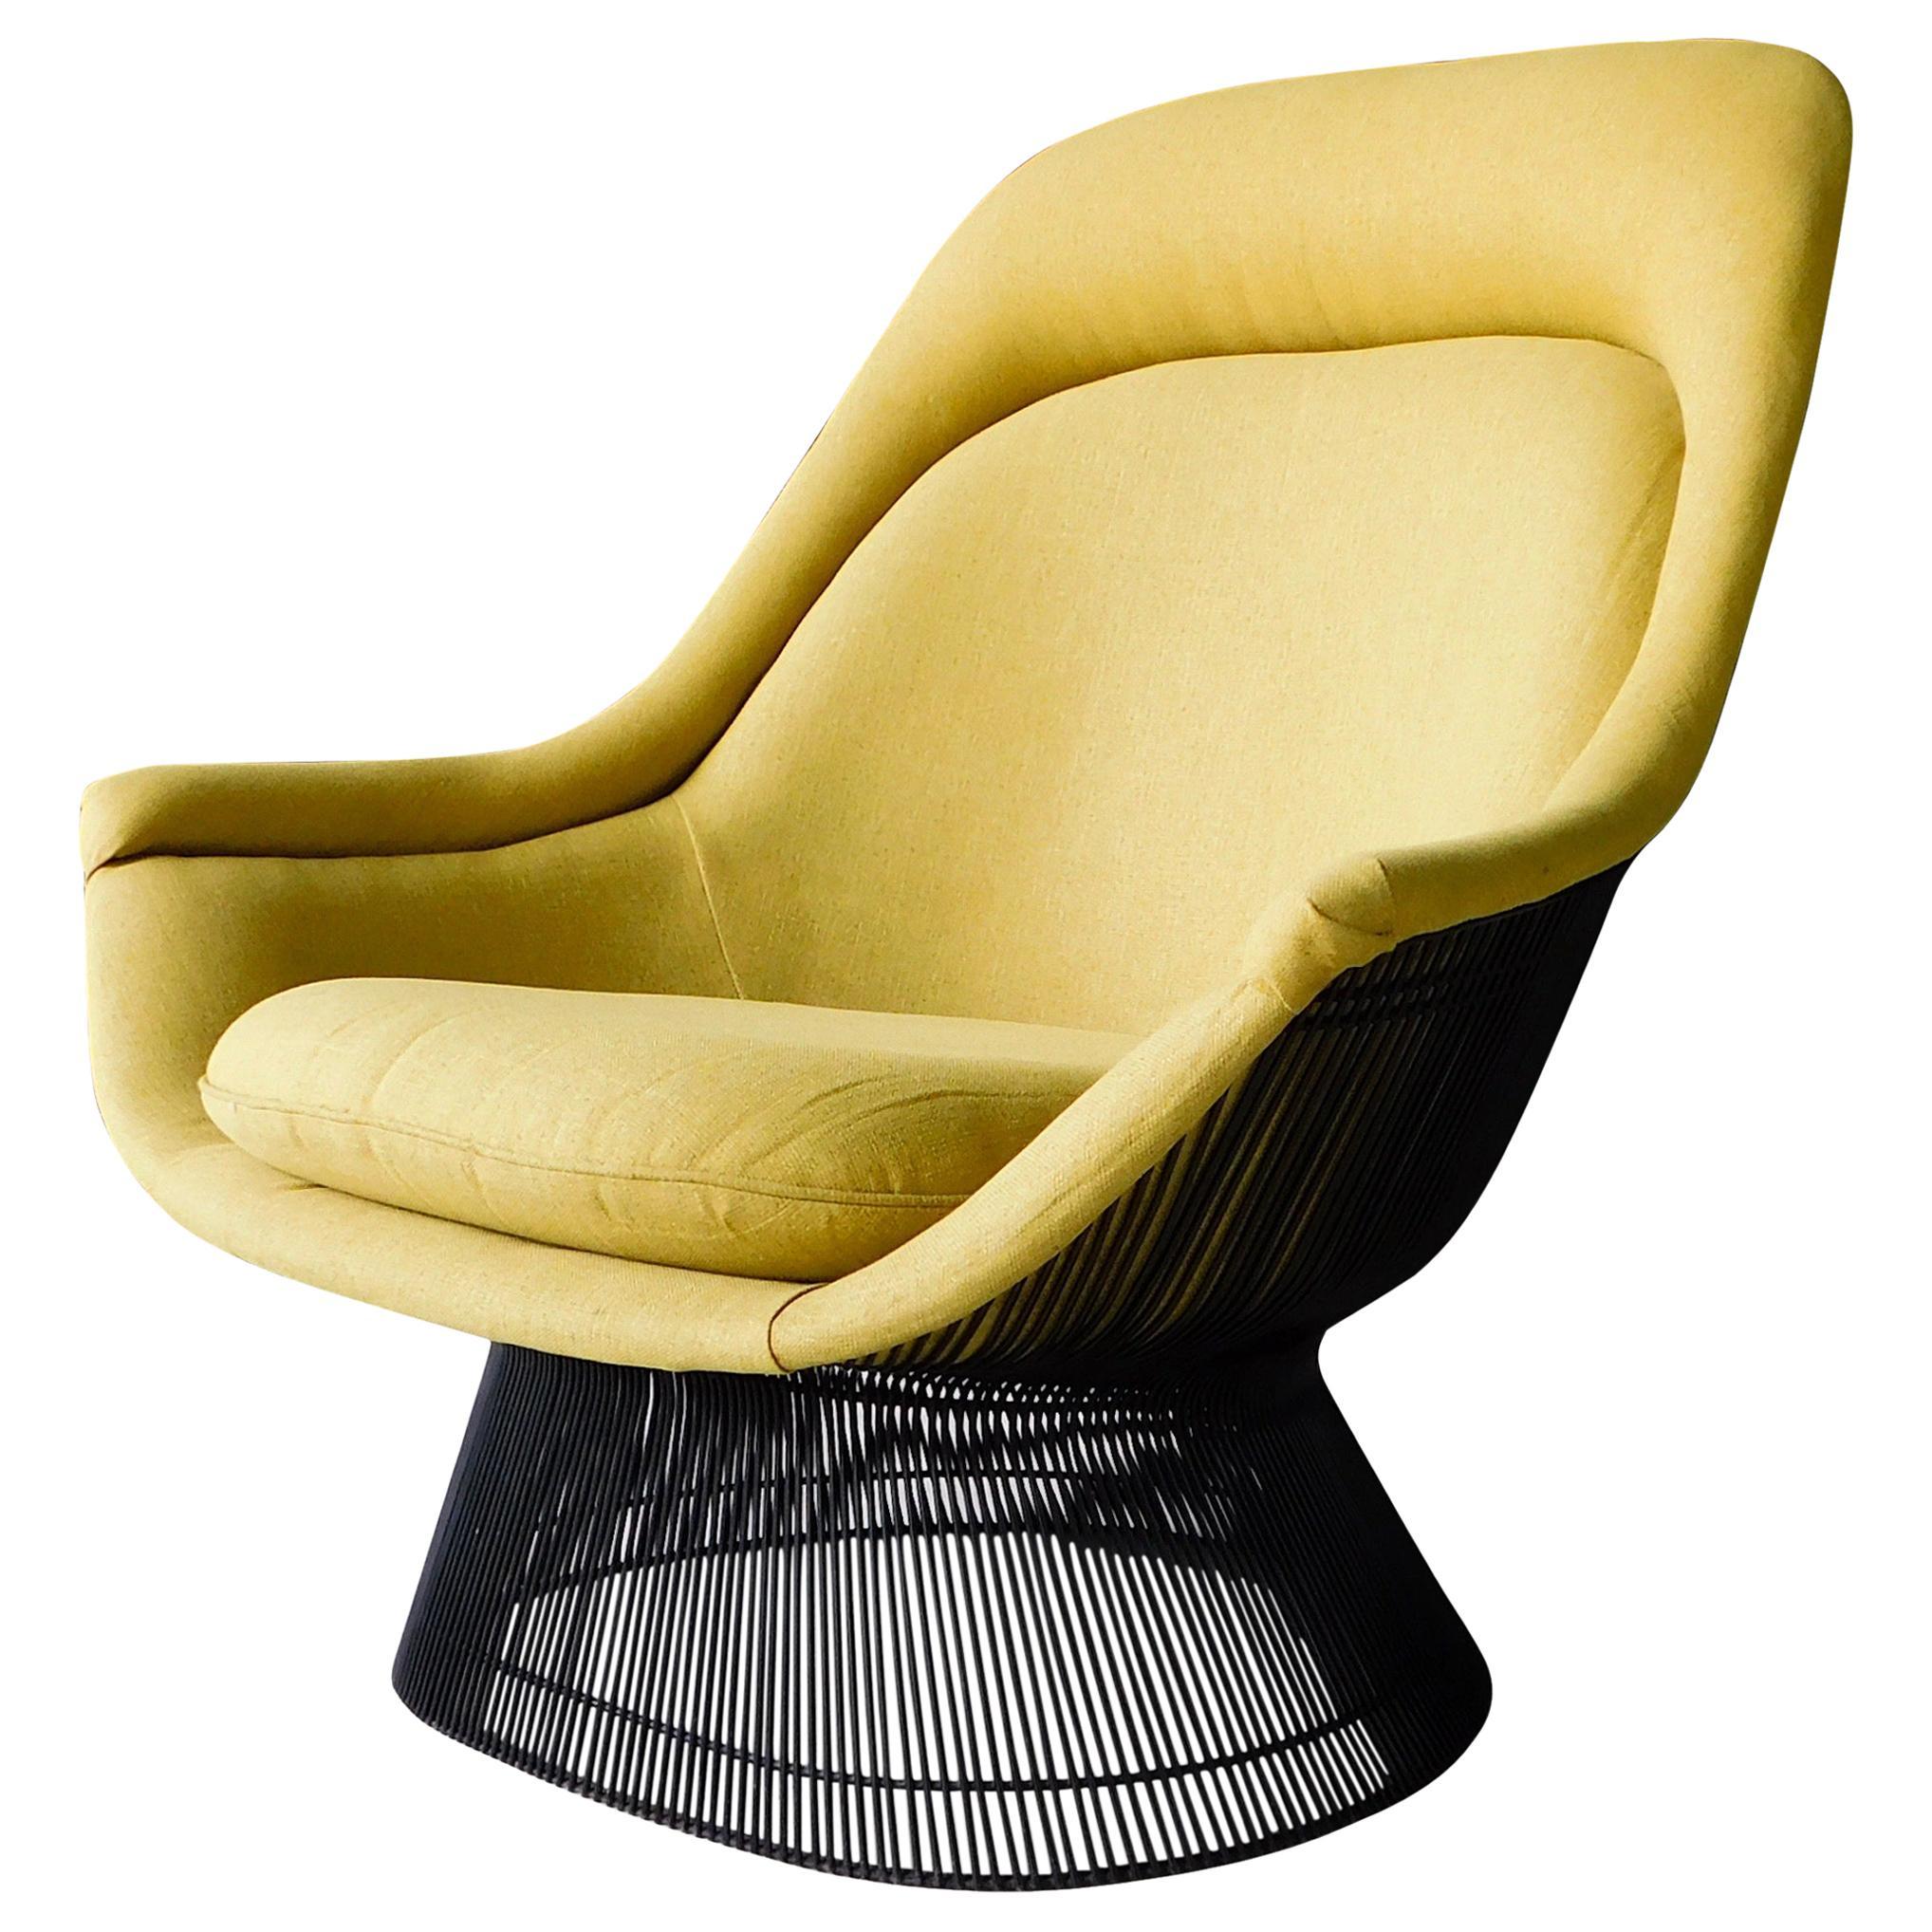 Warren Platner for Knoll Lounge Chair